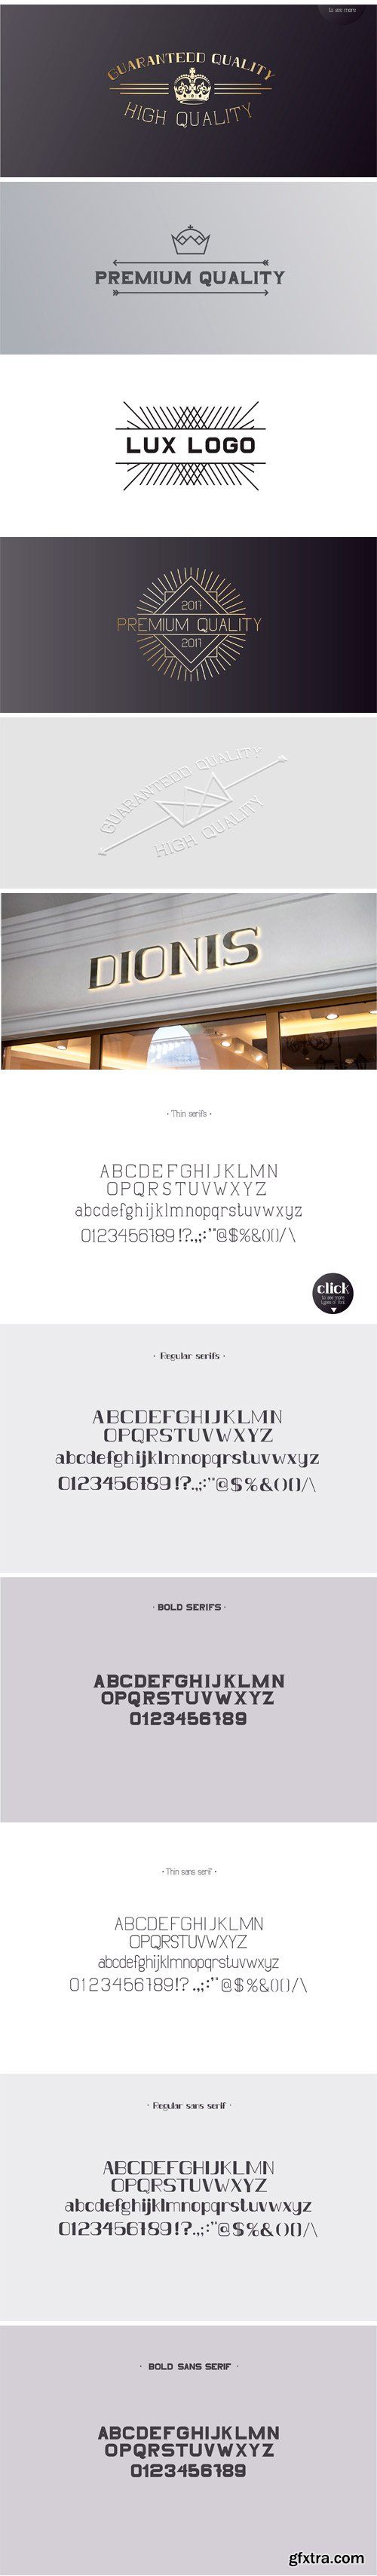 CM - DIONIS Set (Serif & Sans Serif) 1939388